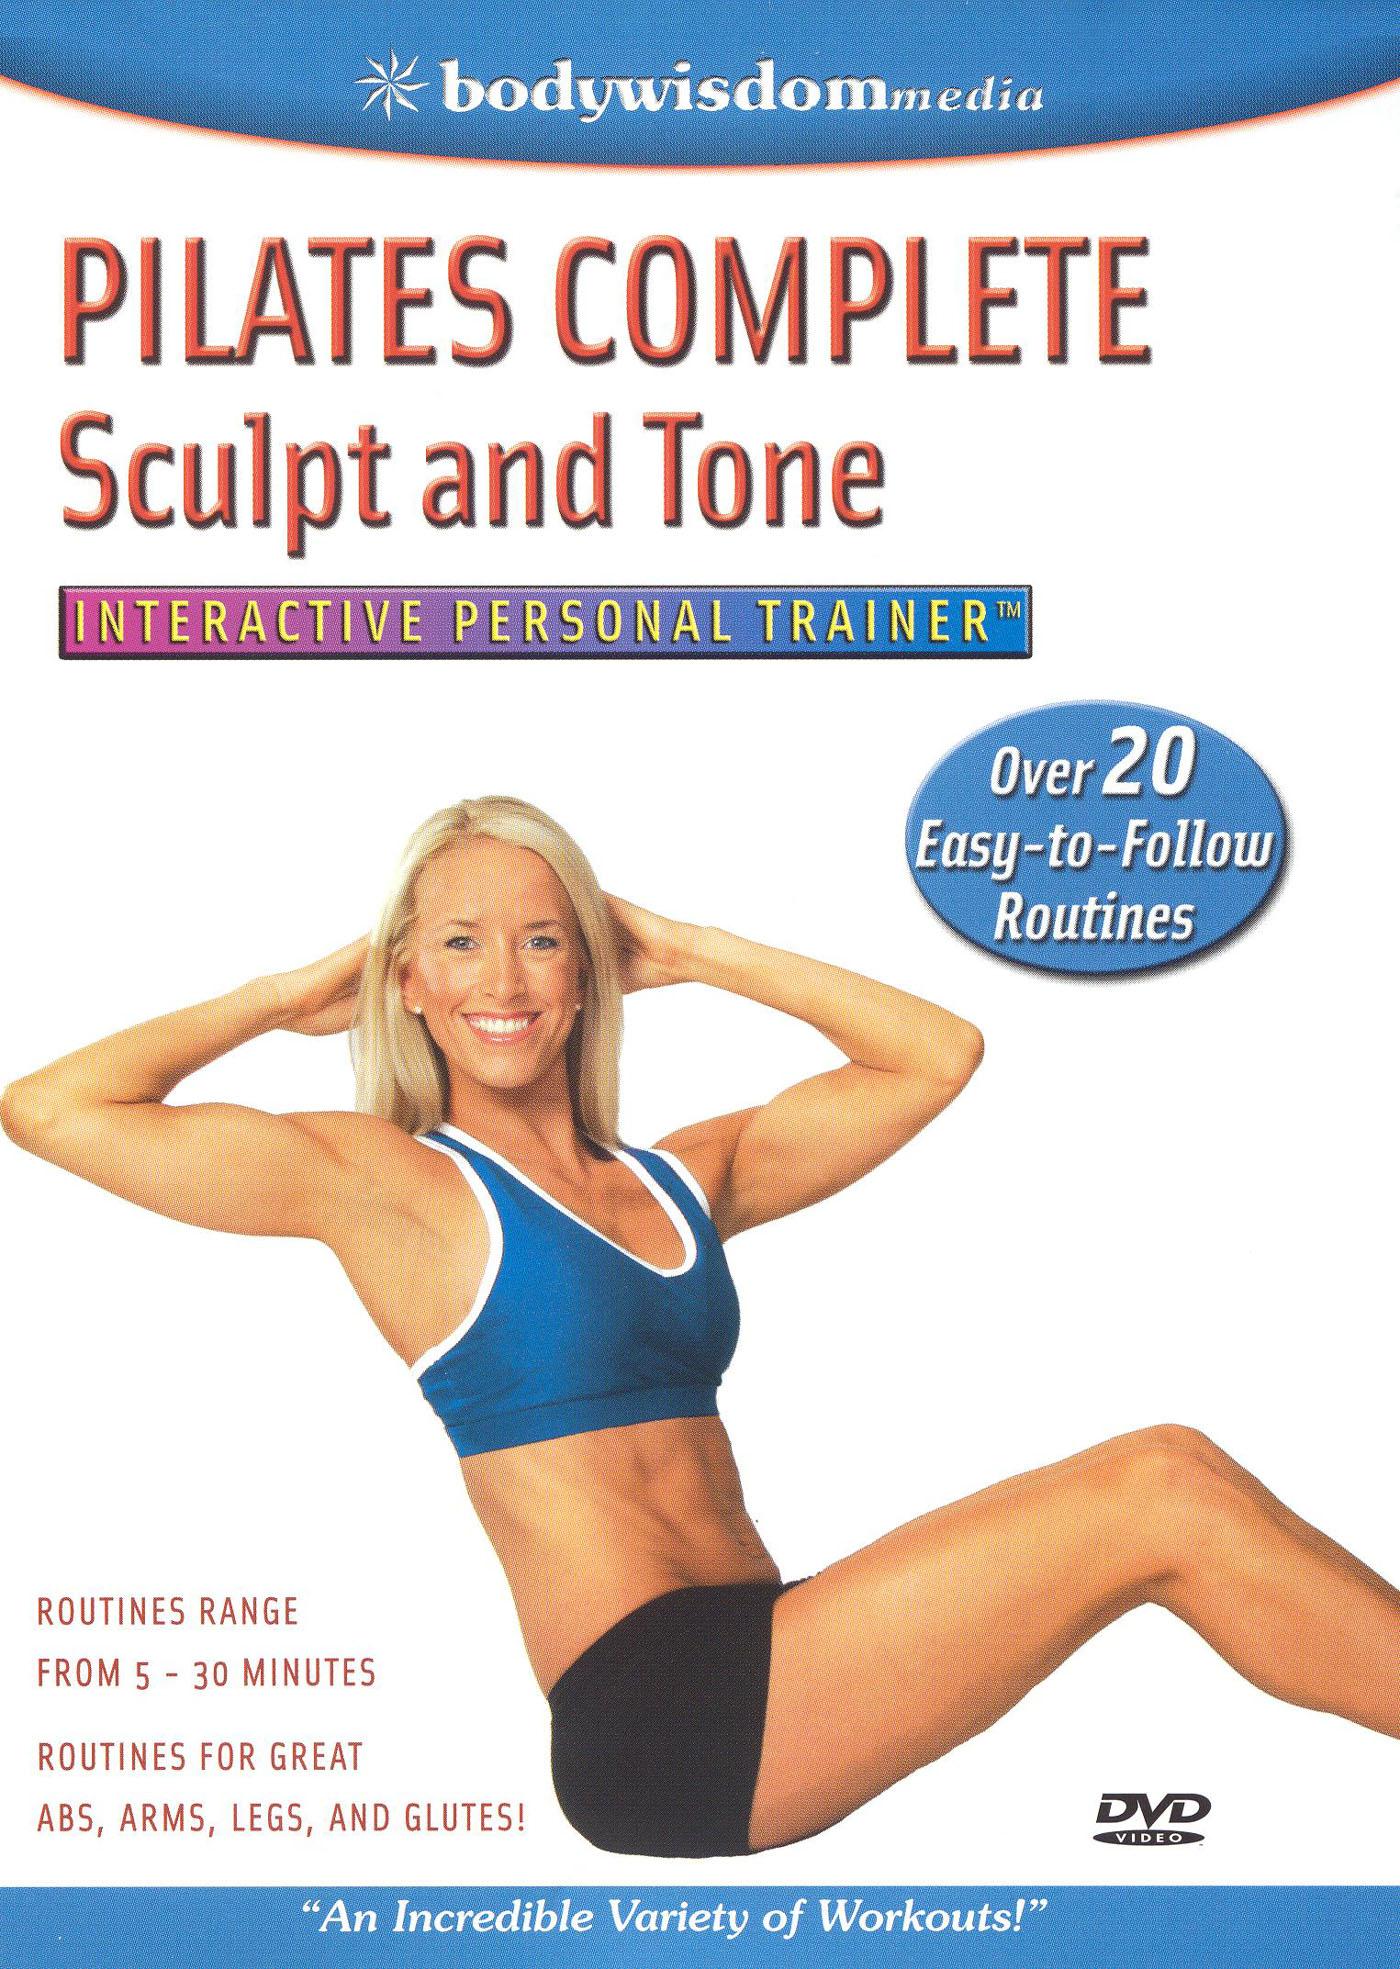 Pilates: Complete Sculpt and Tone